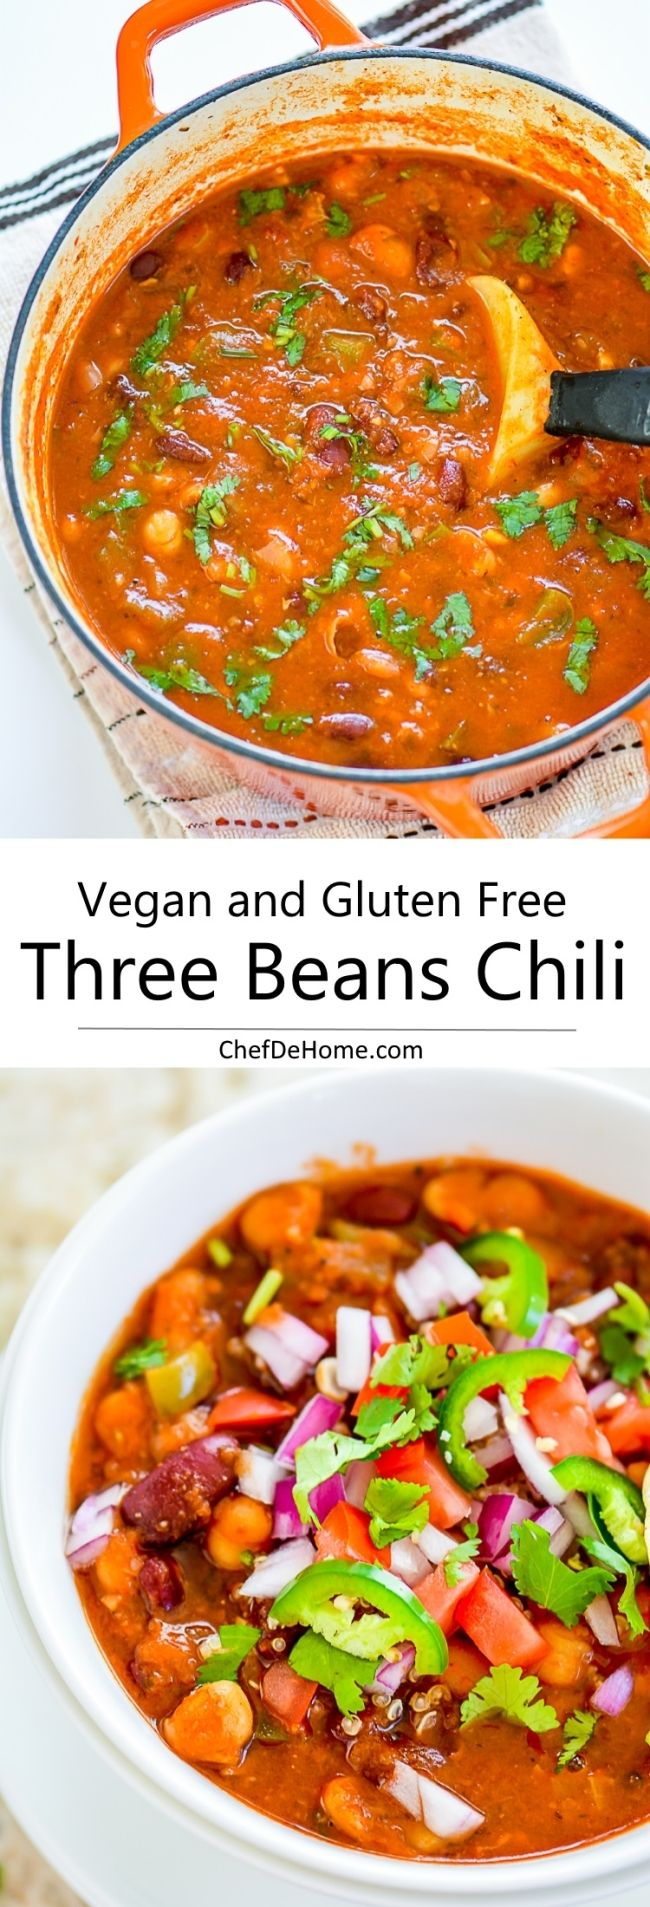 Vegetarian Three Beans Chili with Chickpeas | Recipe | Homemade, Bean ...